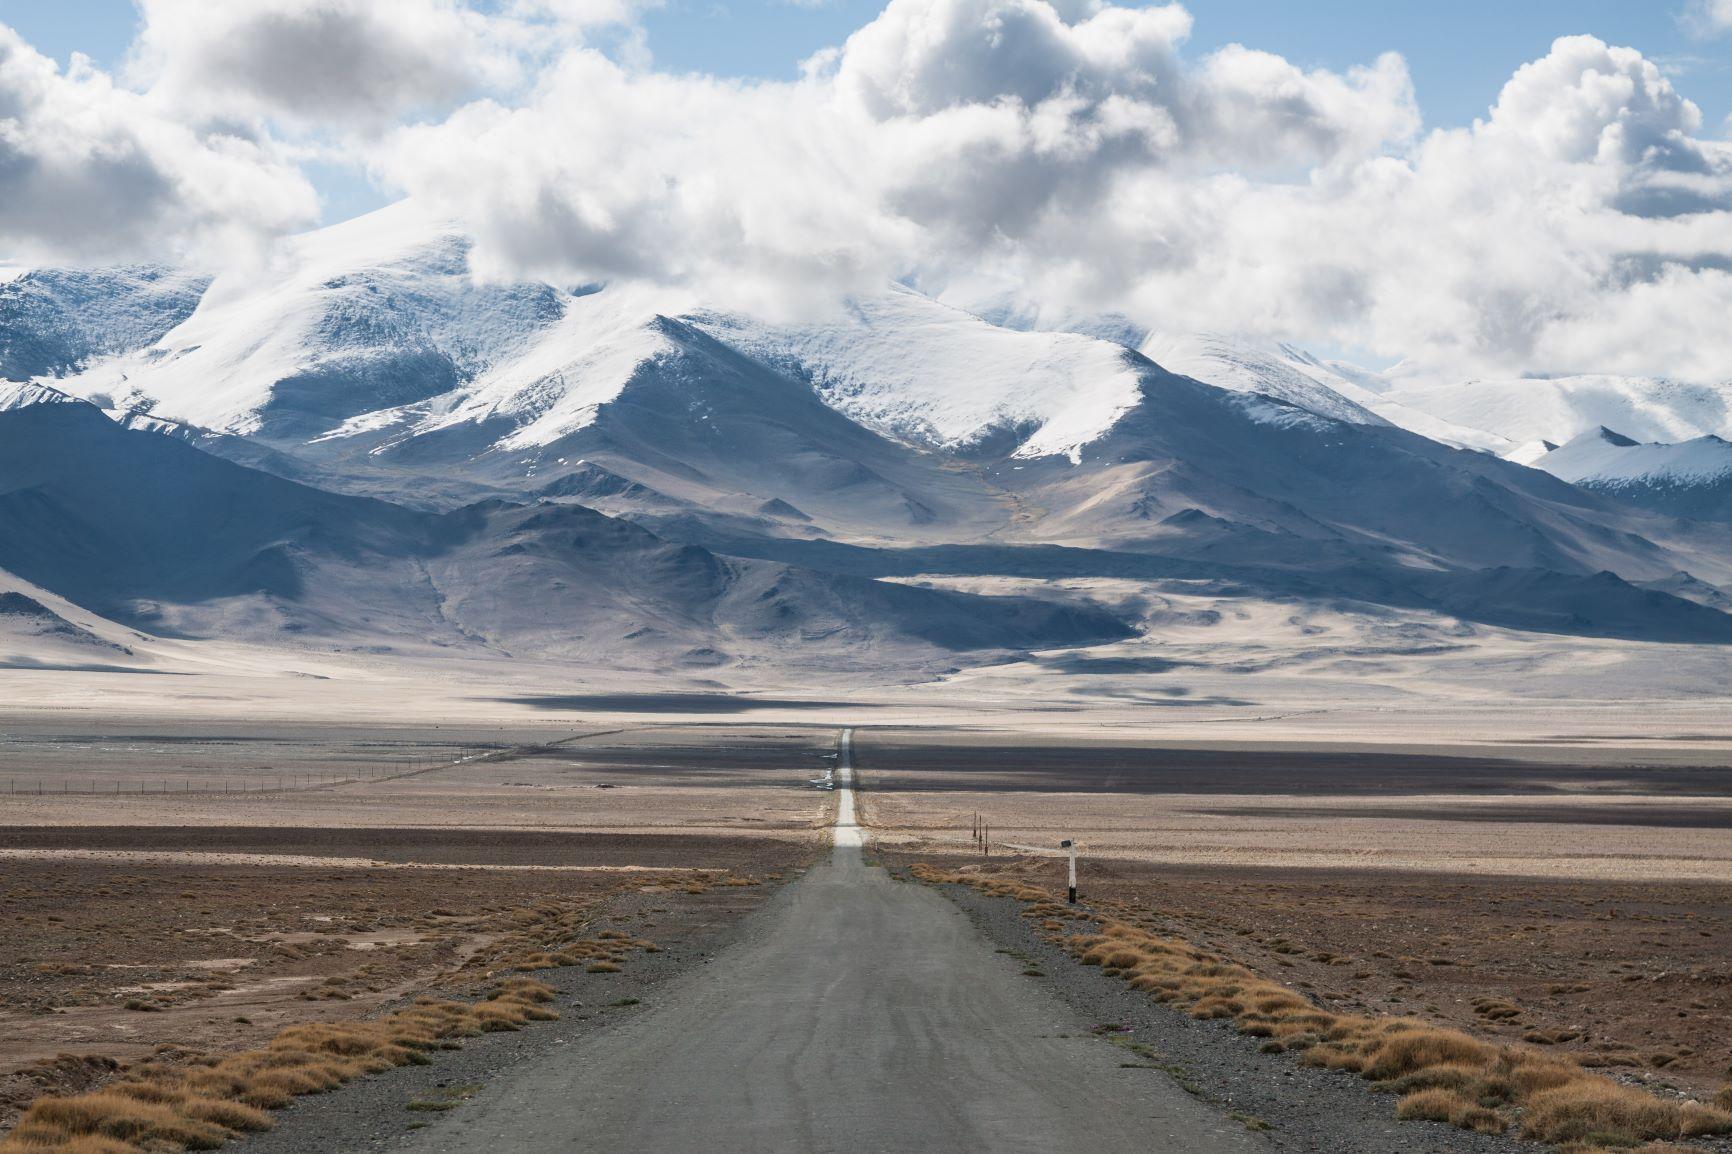 The Pamir Highway in Tajikistan